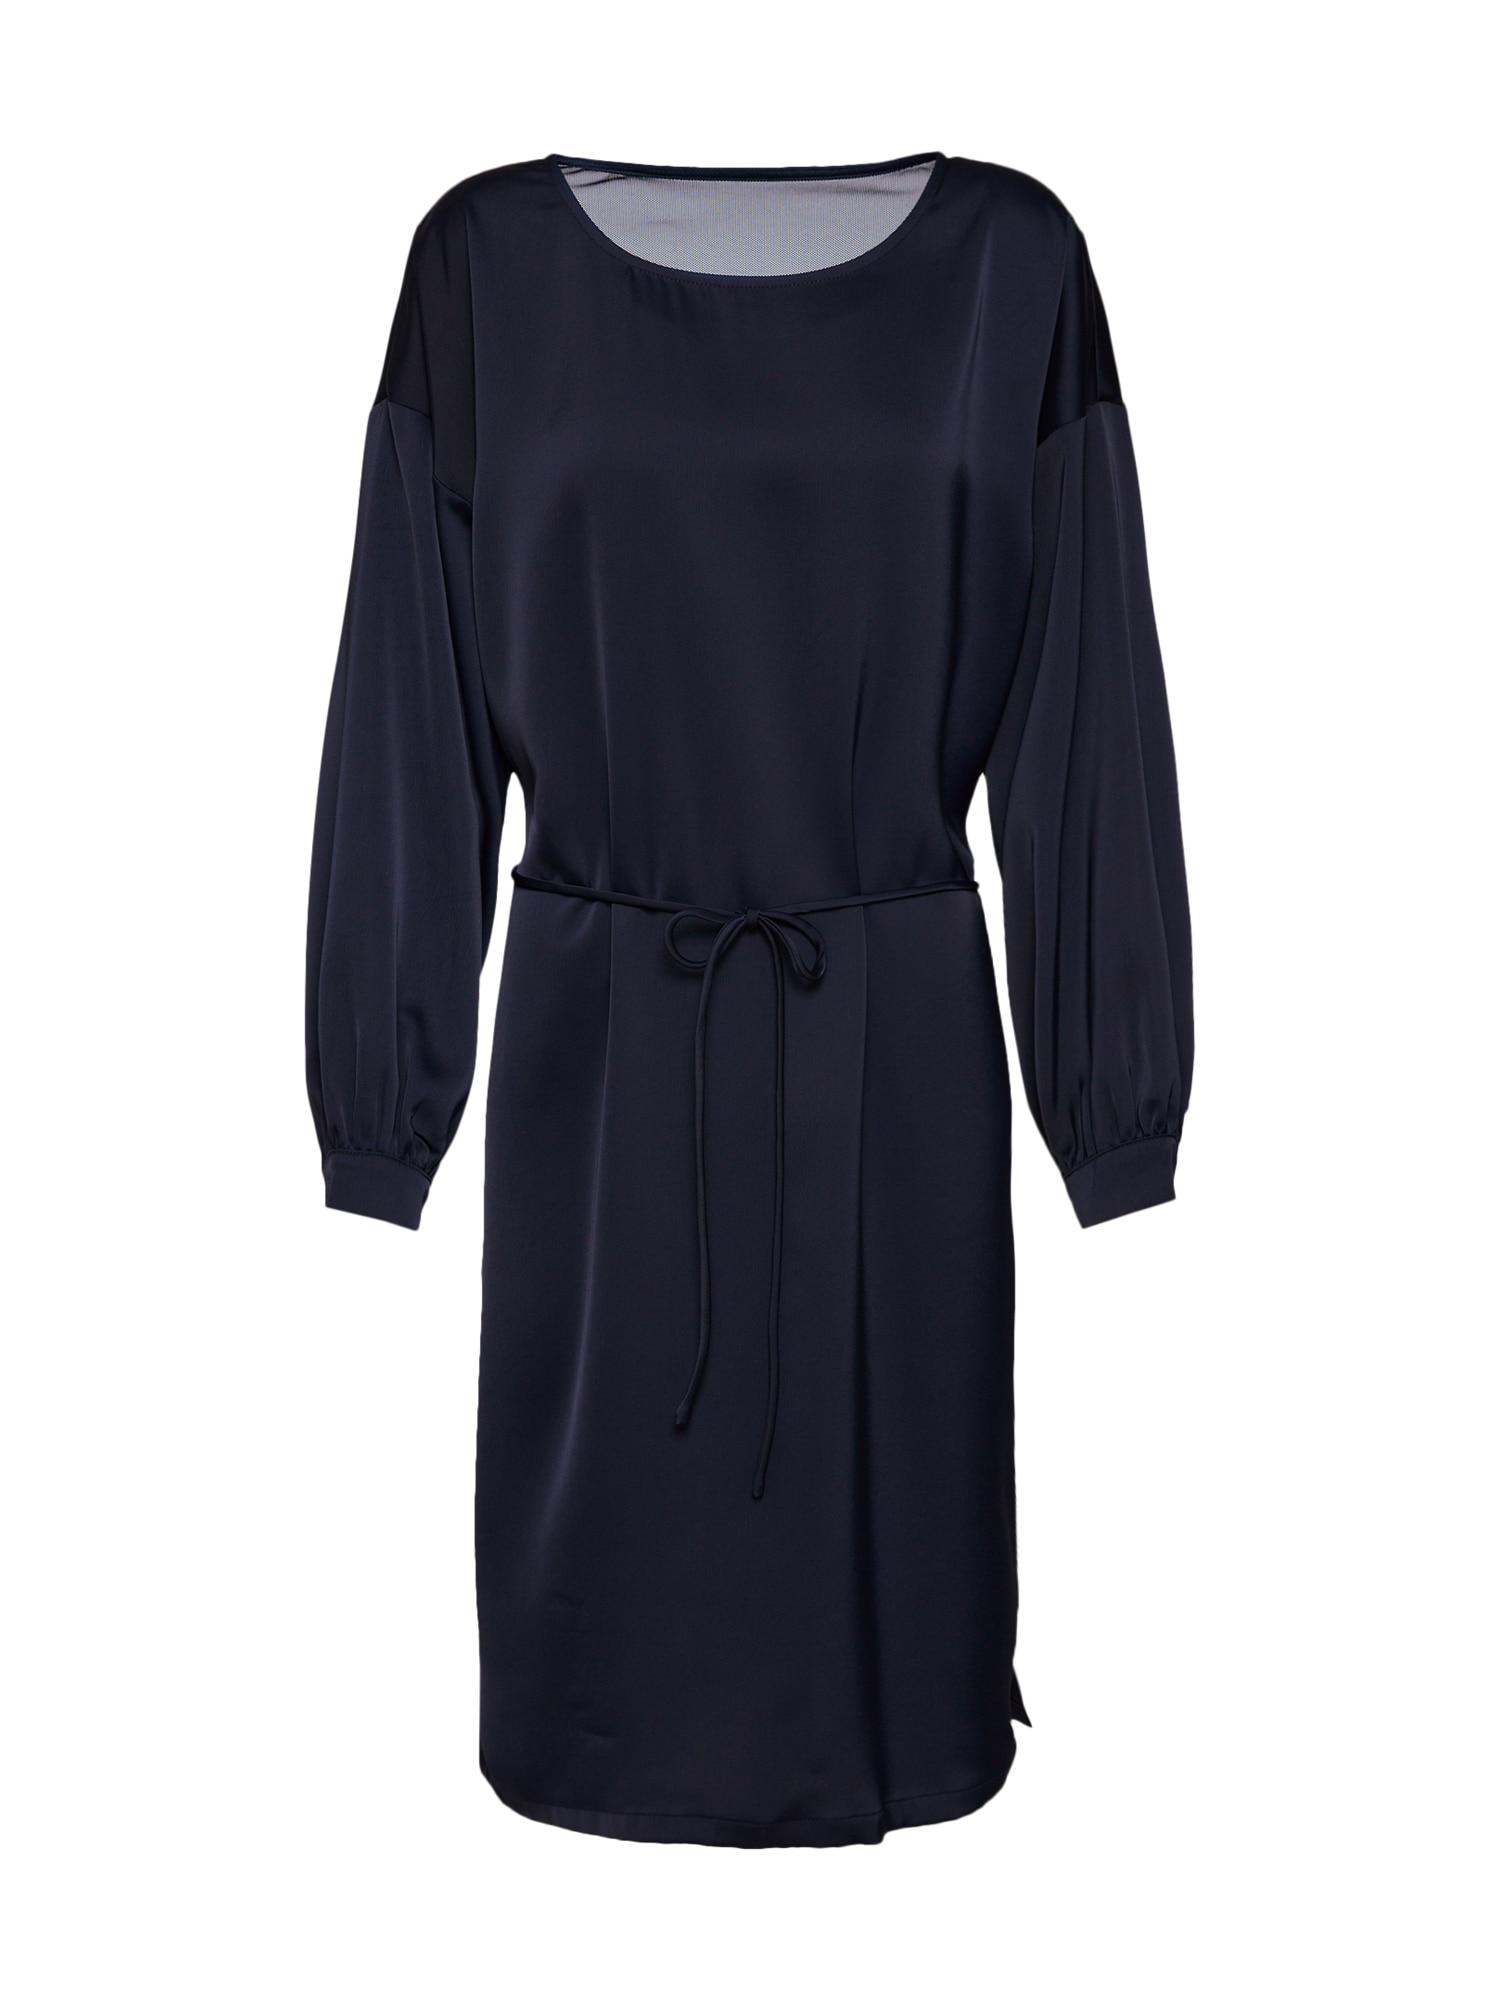 Šaty love269 námořnická modř Love & Divine